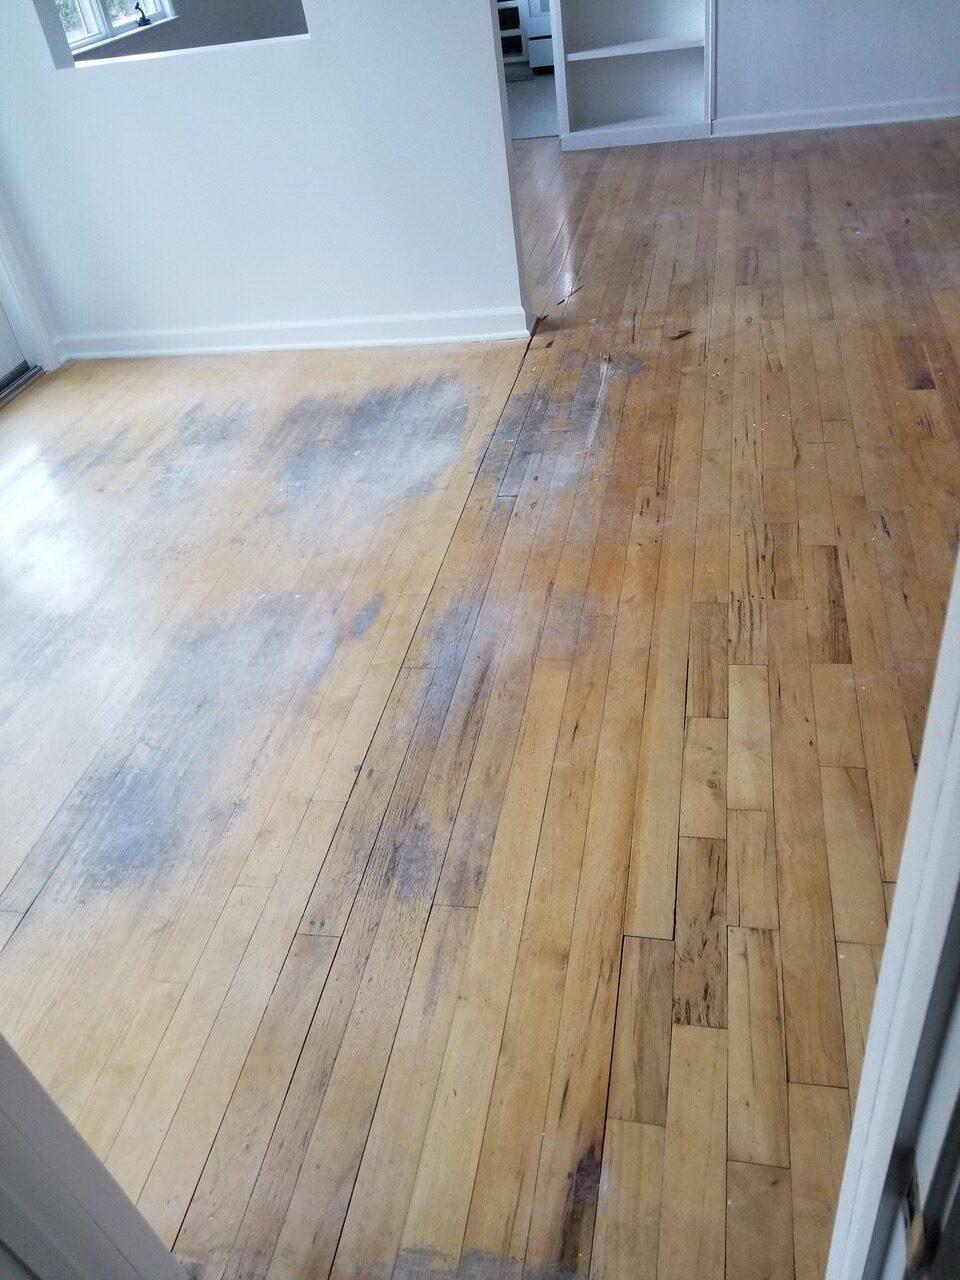 """Before"": San Jose residential hickory nutmeg flooring in need of major repairs."